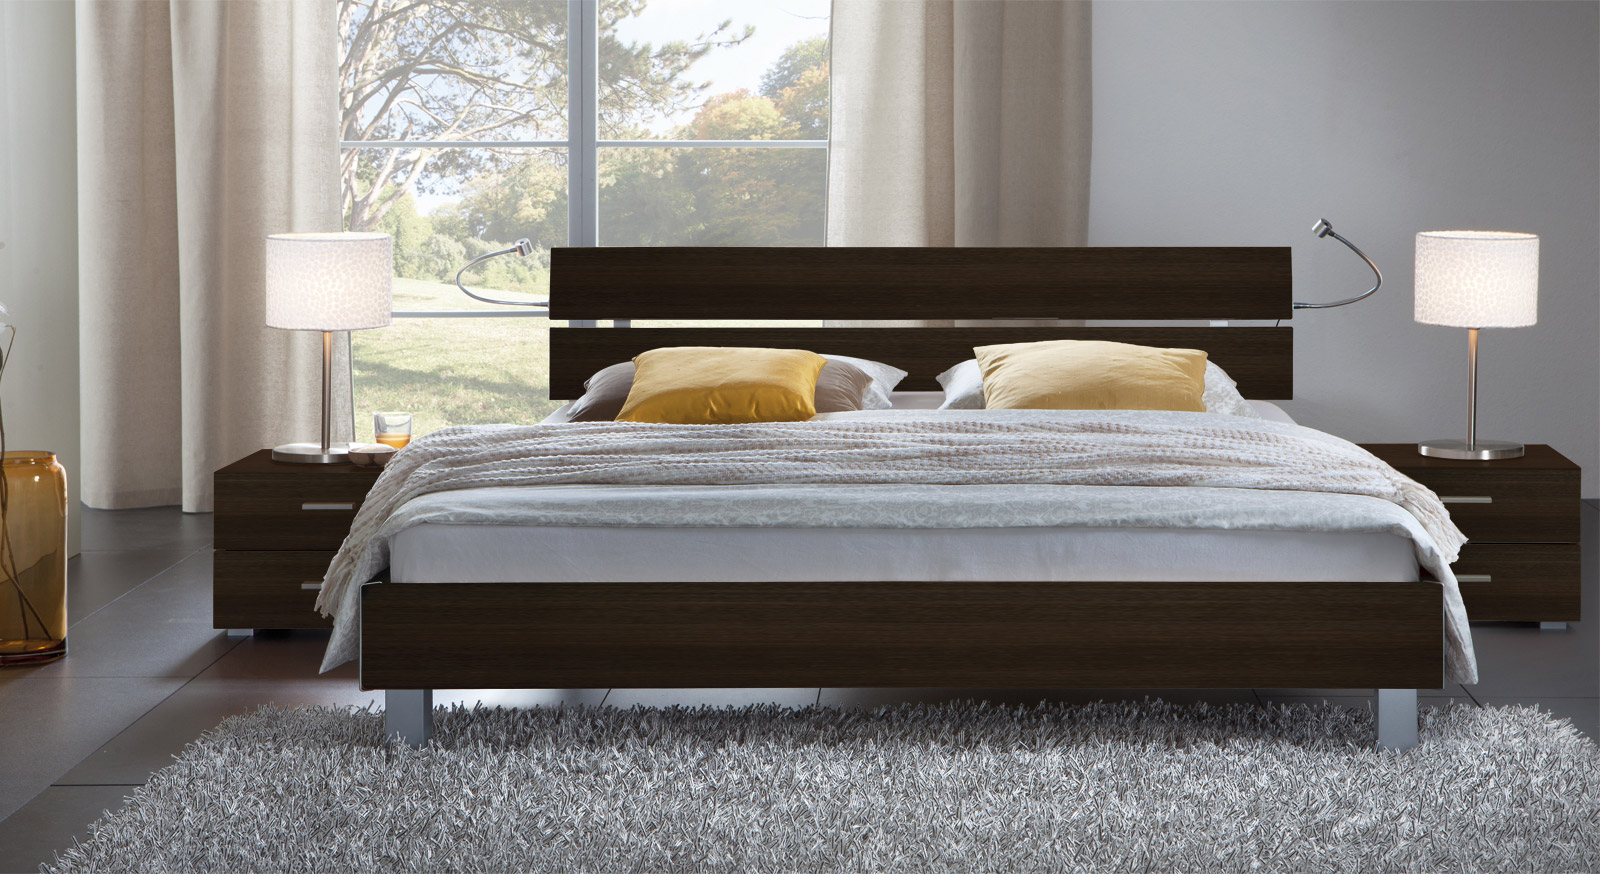 Full Size of Tiefes Designer Bett Online Gnstig Kaufen Treviso Bettende Bett Betten.de